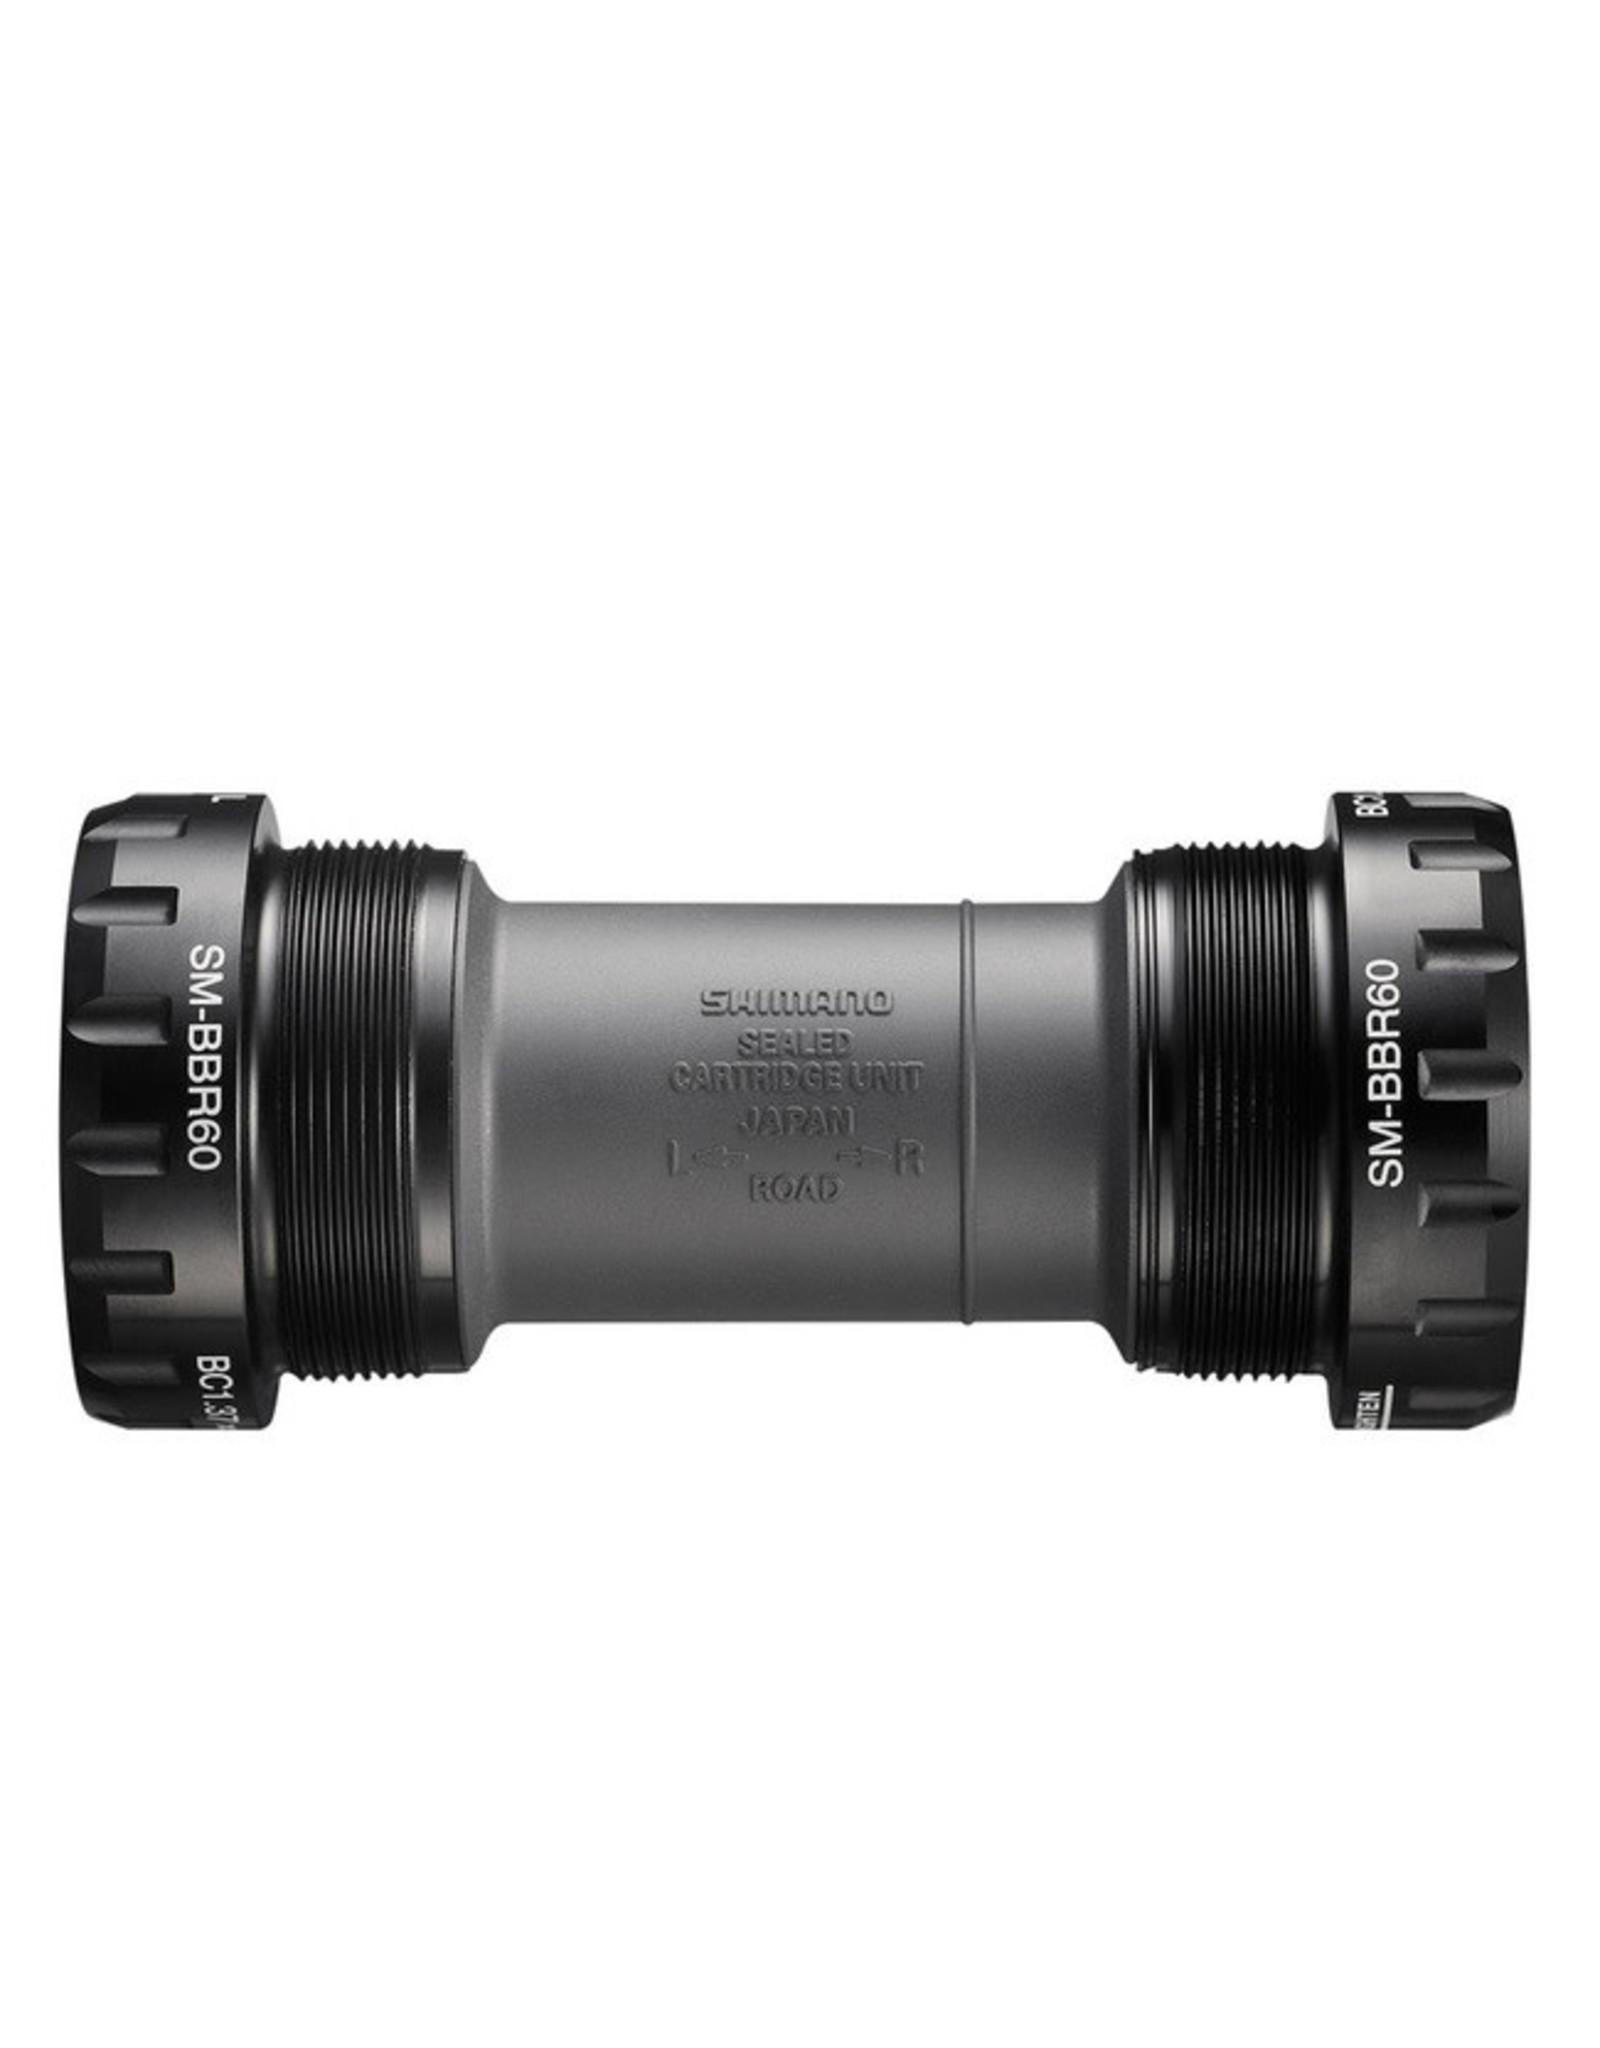 Shimano Bottom bracket Shim BSA BBR60 Ult/105 68mm FC25 (road)